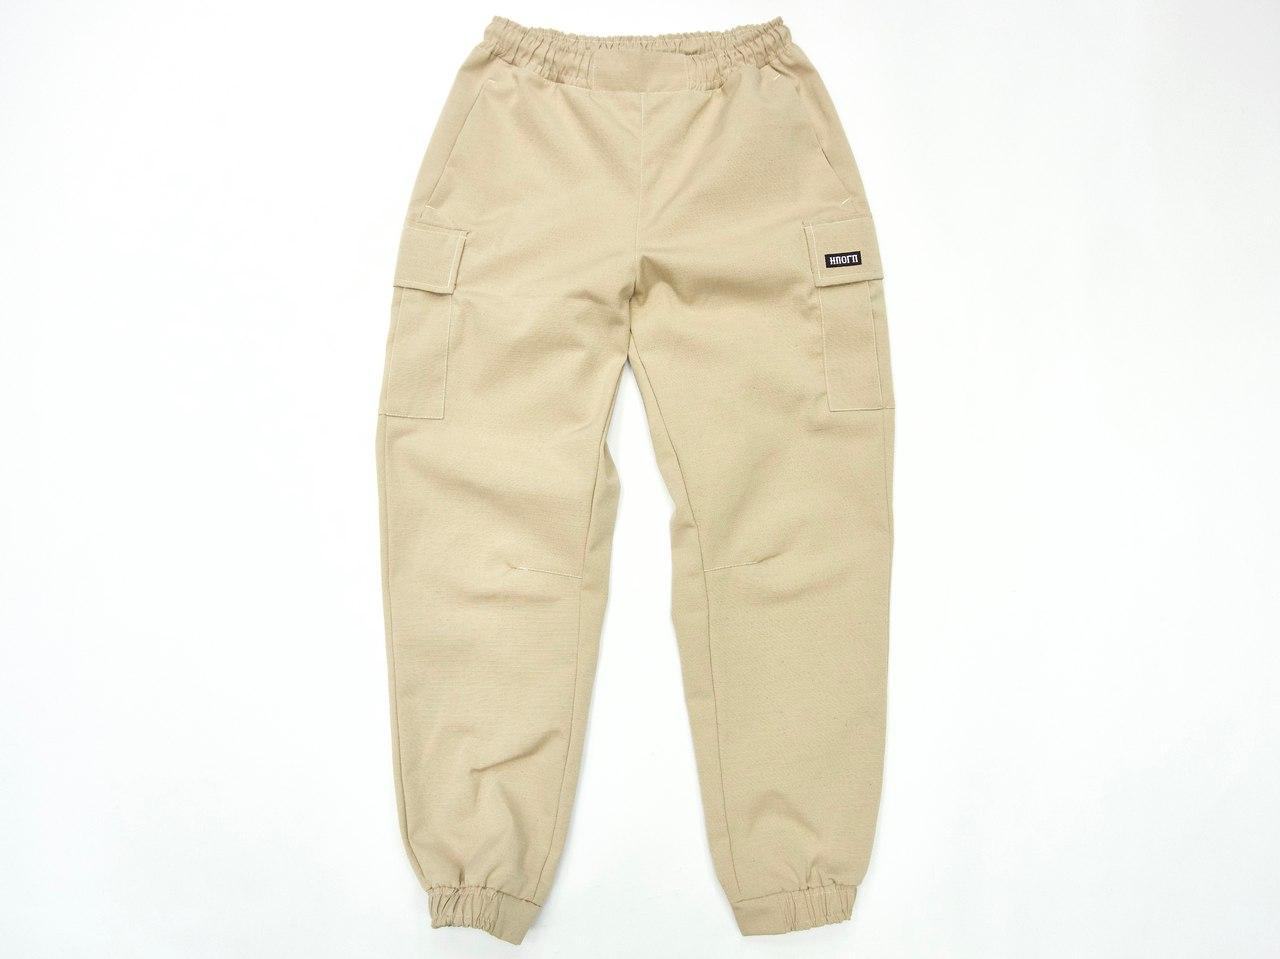 НПОГП брюки Габарит карго (бежевый рип-стоп )